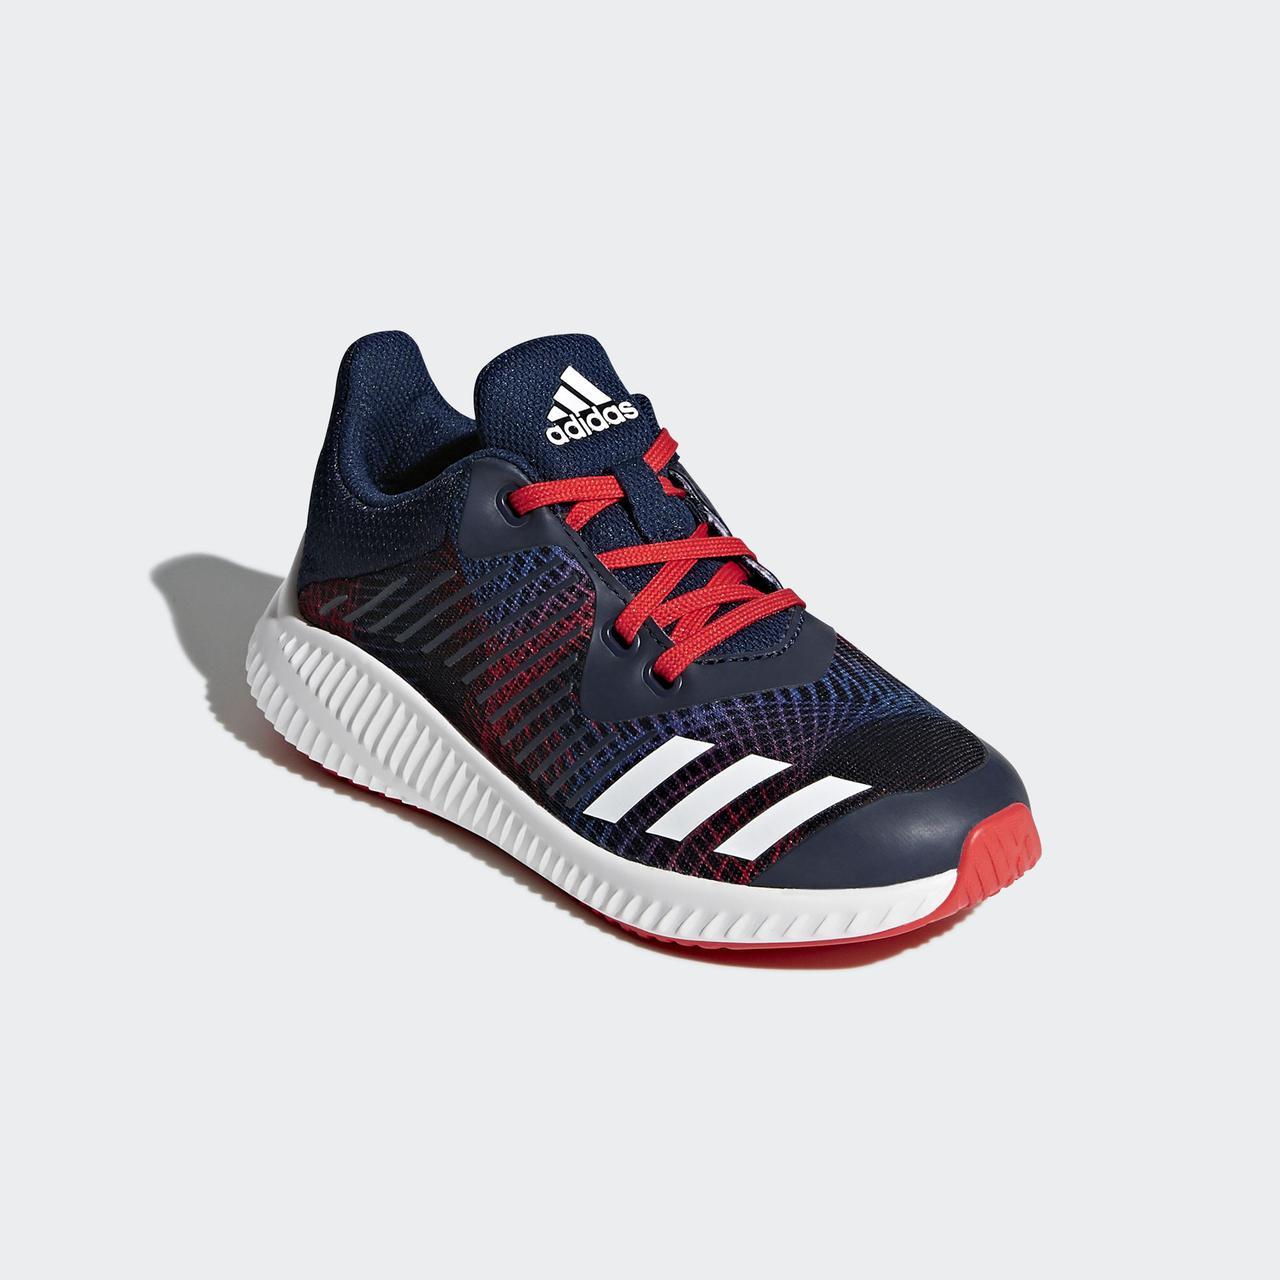 4fe38ba66 ... Детские кроссовки Adidas Performance Fortarun (Артикул: CP9994), ...